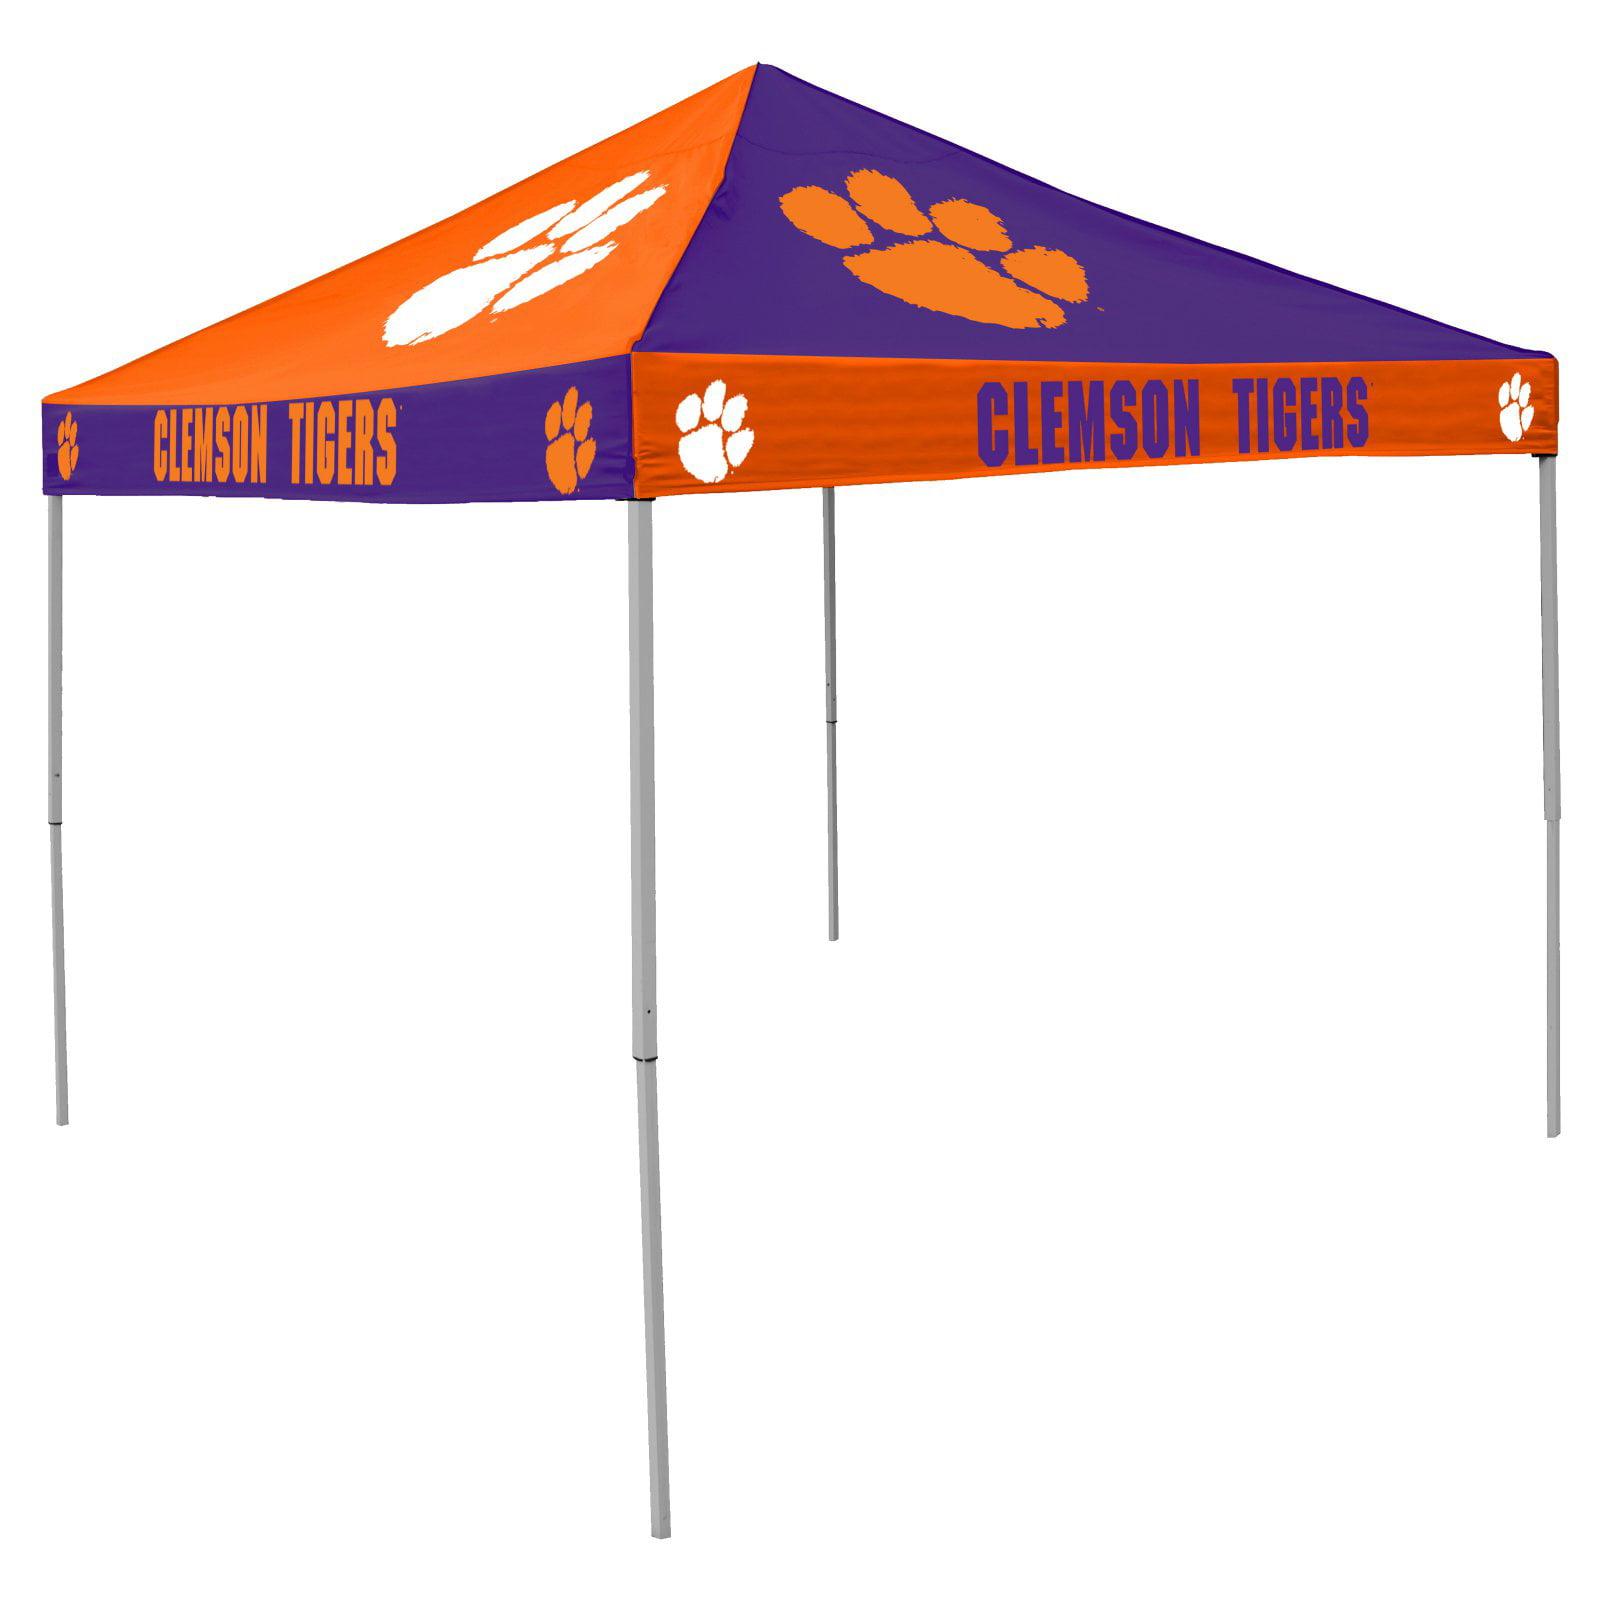 Clemson Tigers CB Canopy